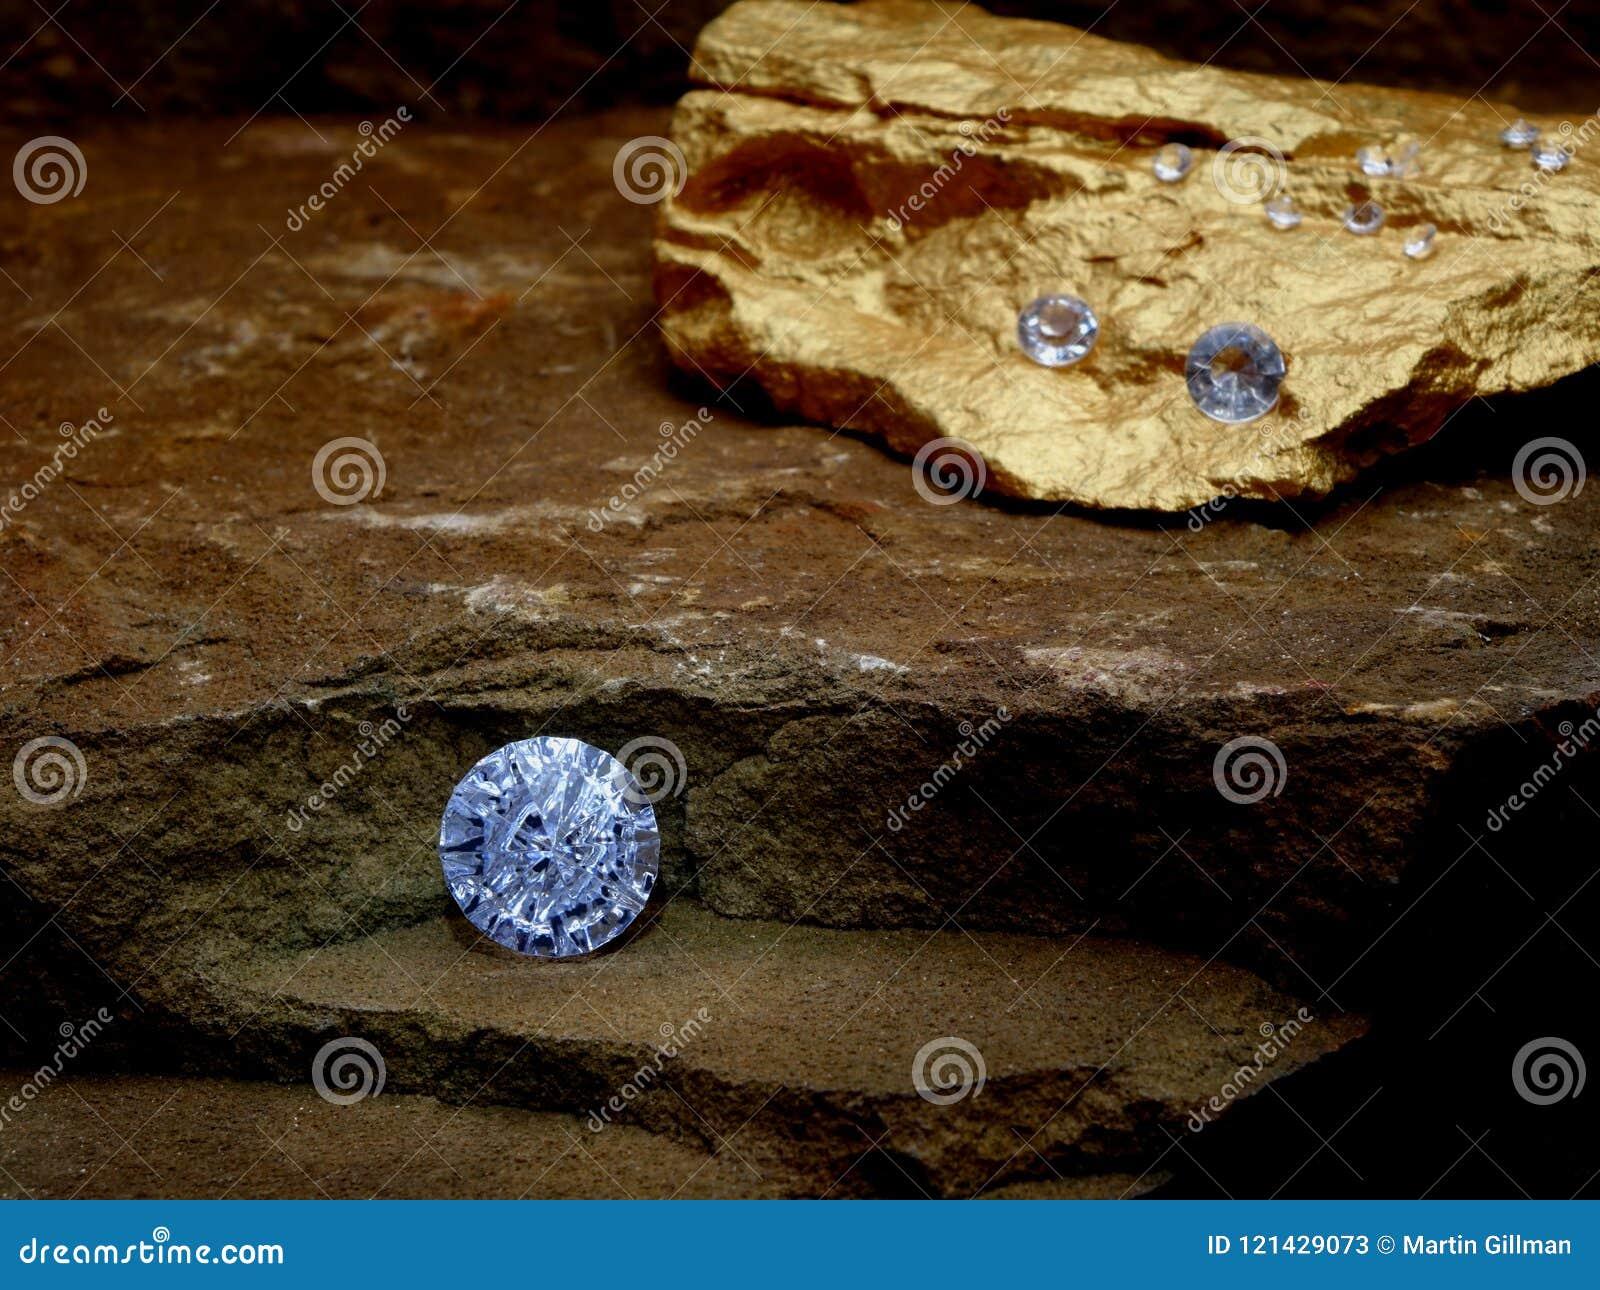 A Diamond on a Rock Step.